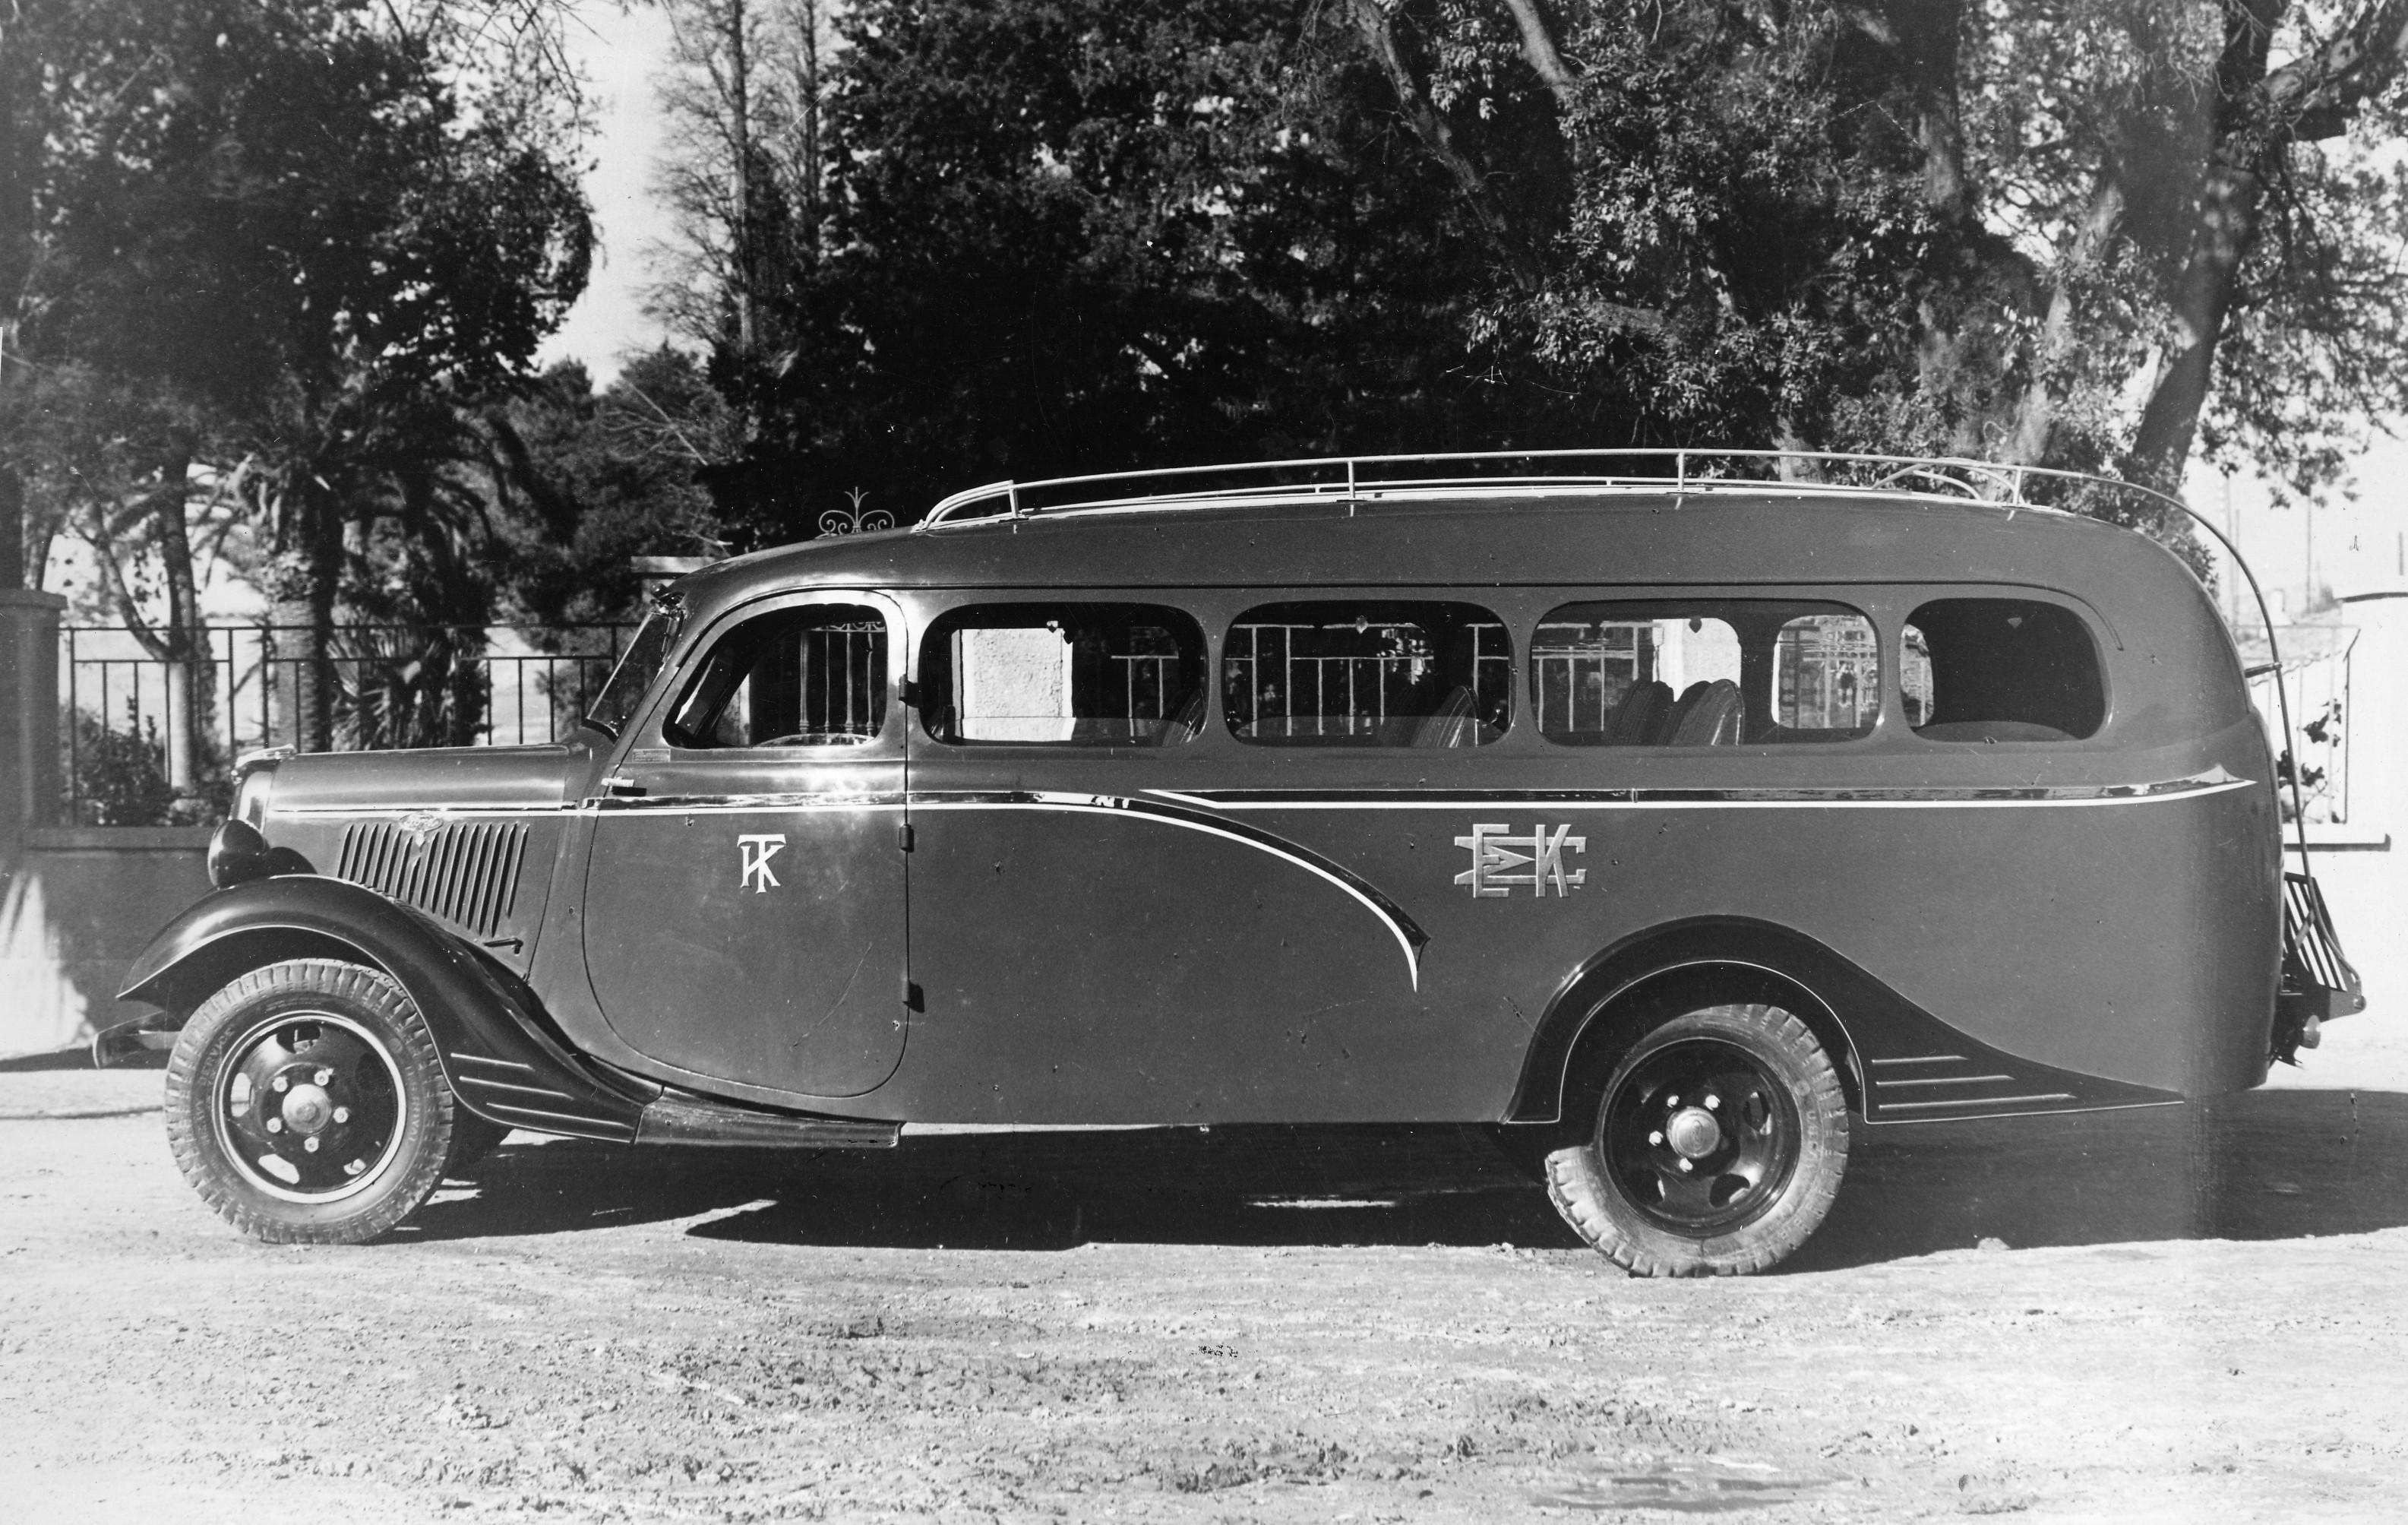 File:Tangalakis Ford 1935.jpg